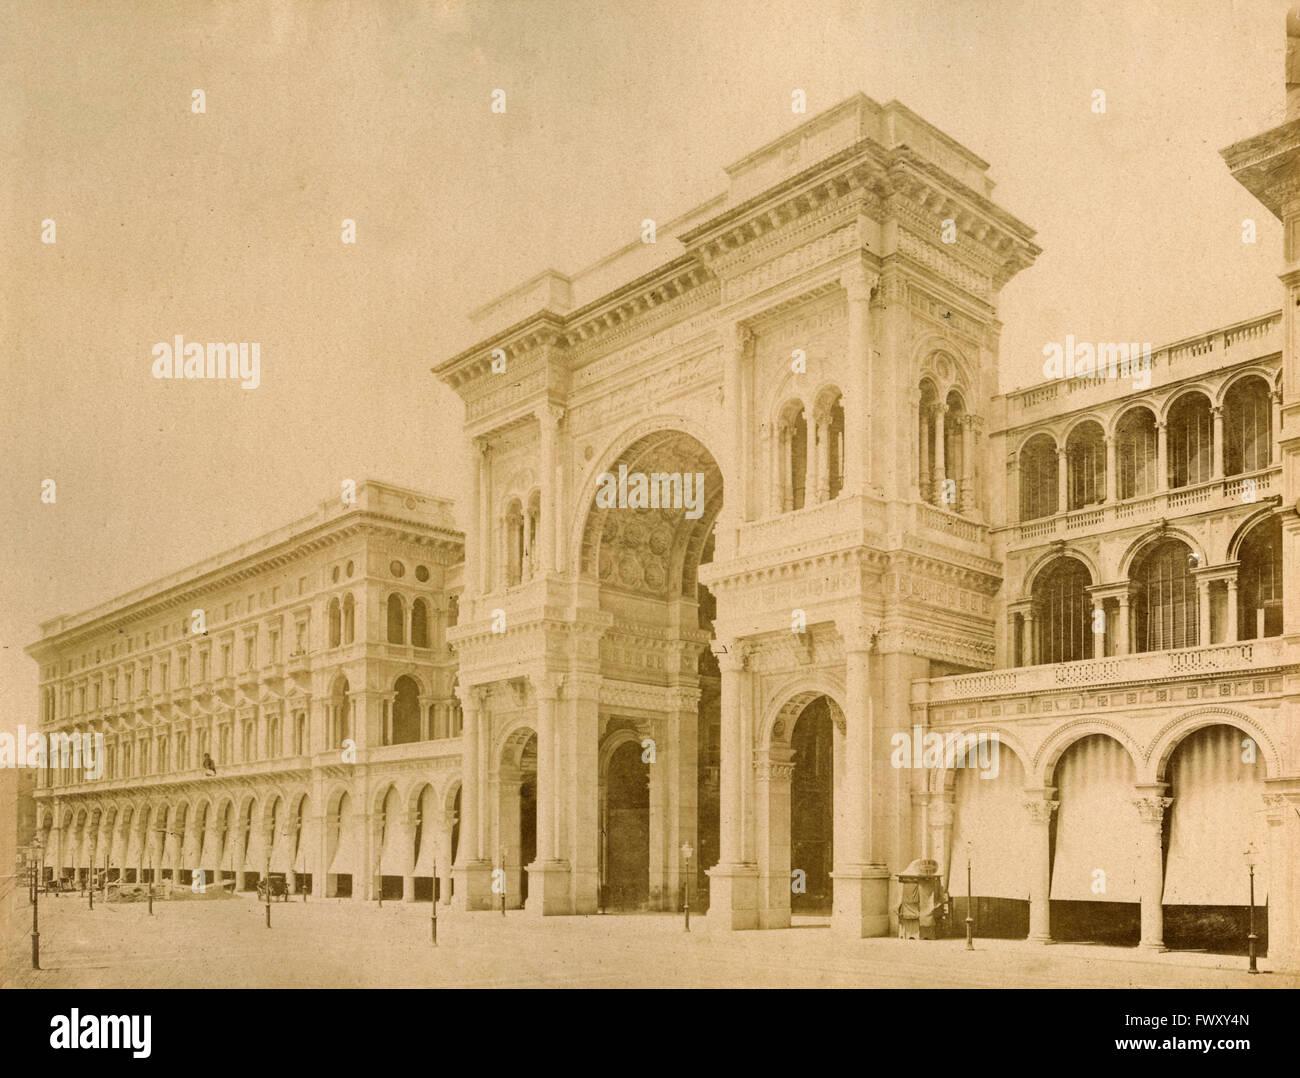 Gallery Vittorio Emanuele, Milan, Italy - Stock Image